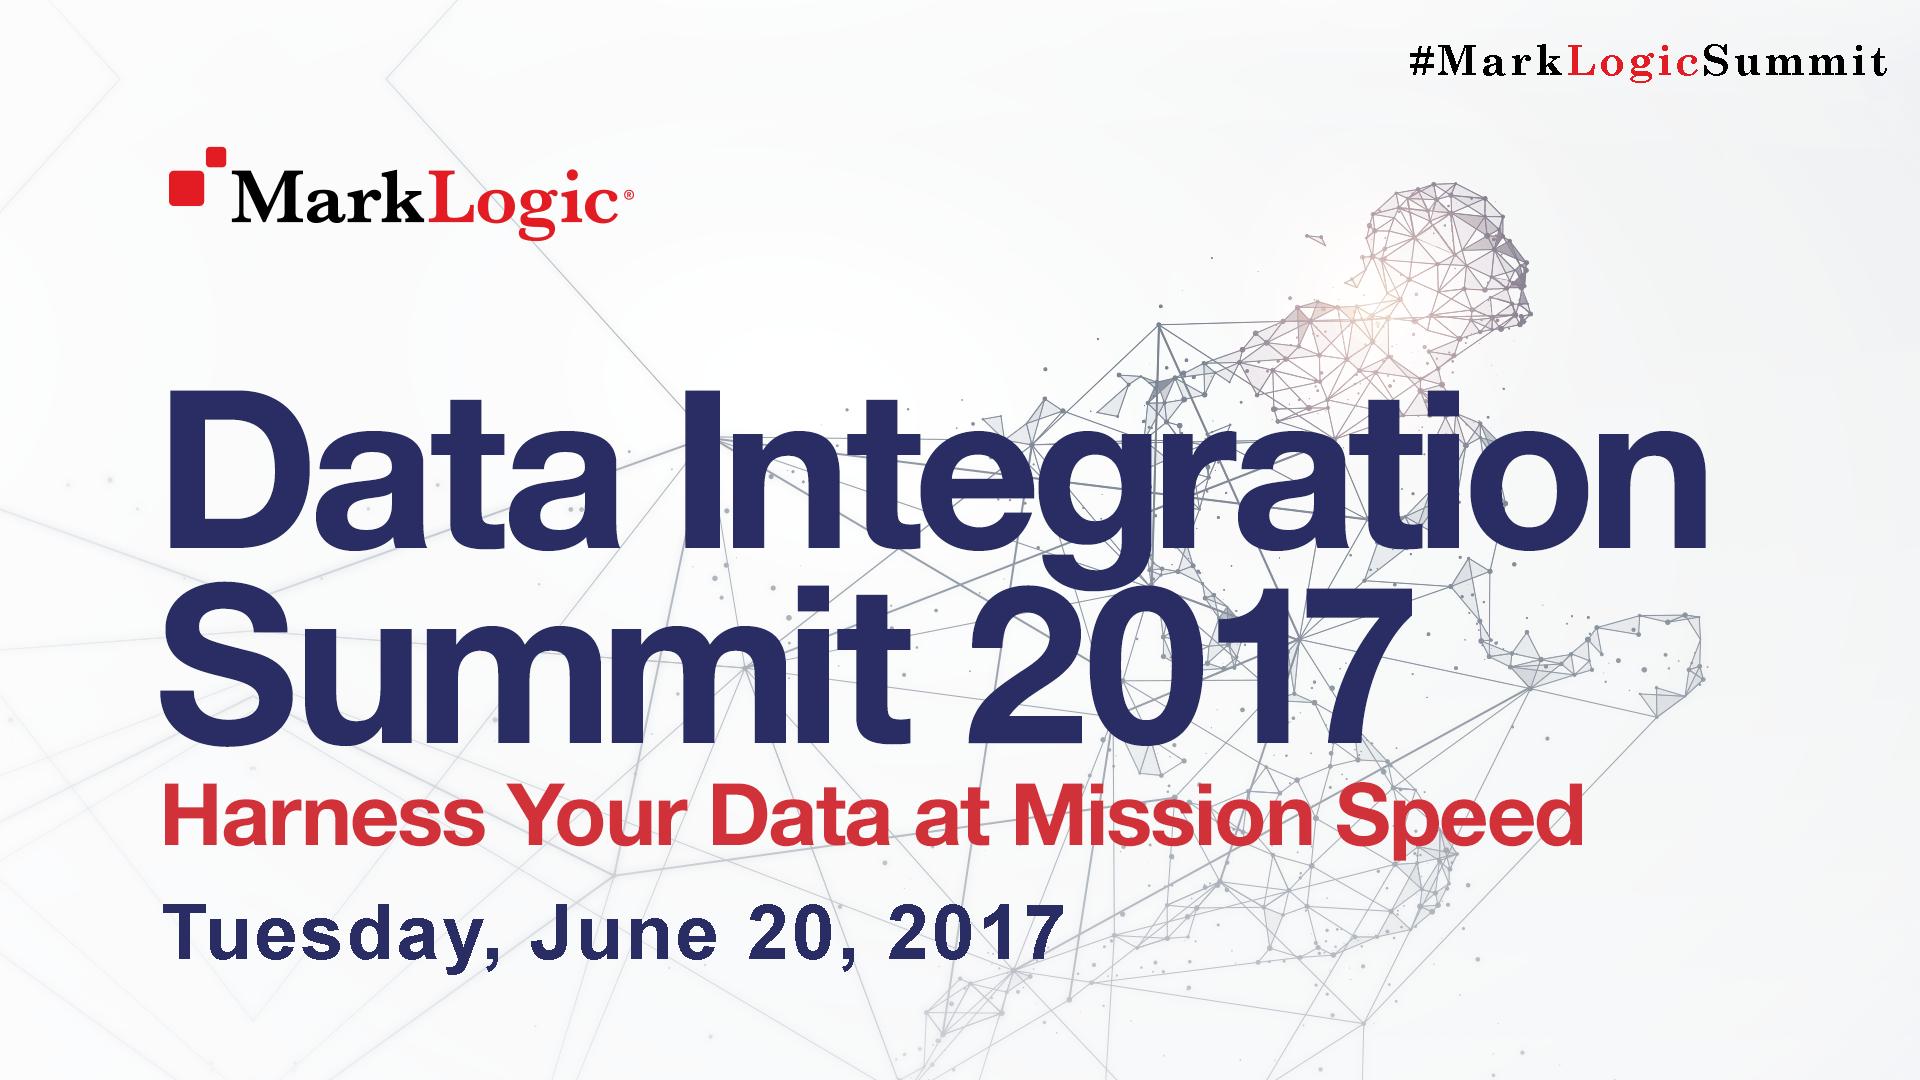 mL_data_integration_summit.png